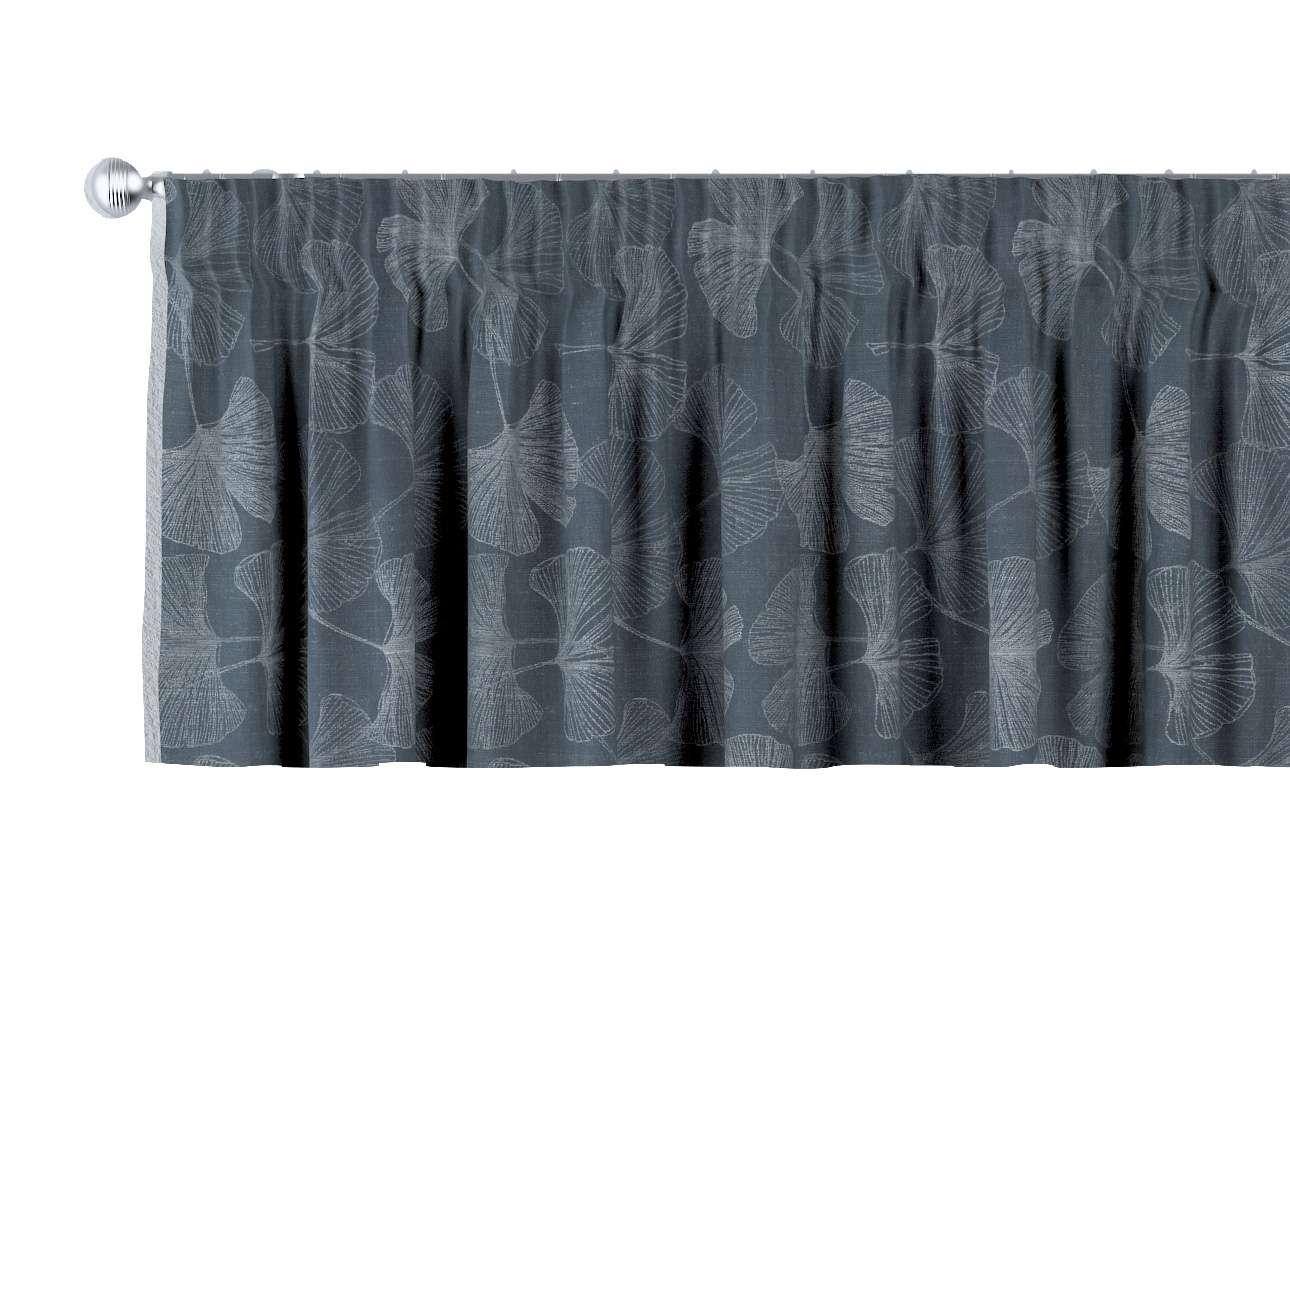 Kurzgardine mit Kräuselband von der Kollektion Venice, Stoff: 143-52